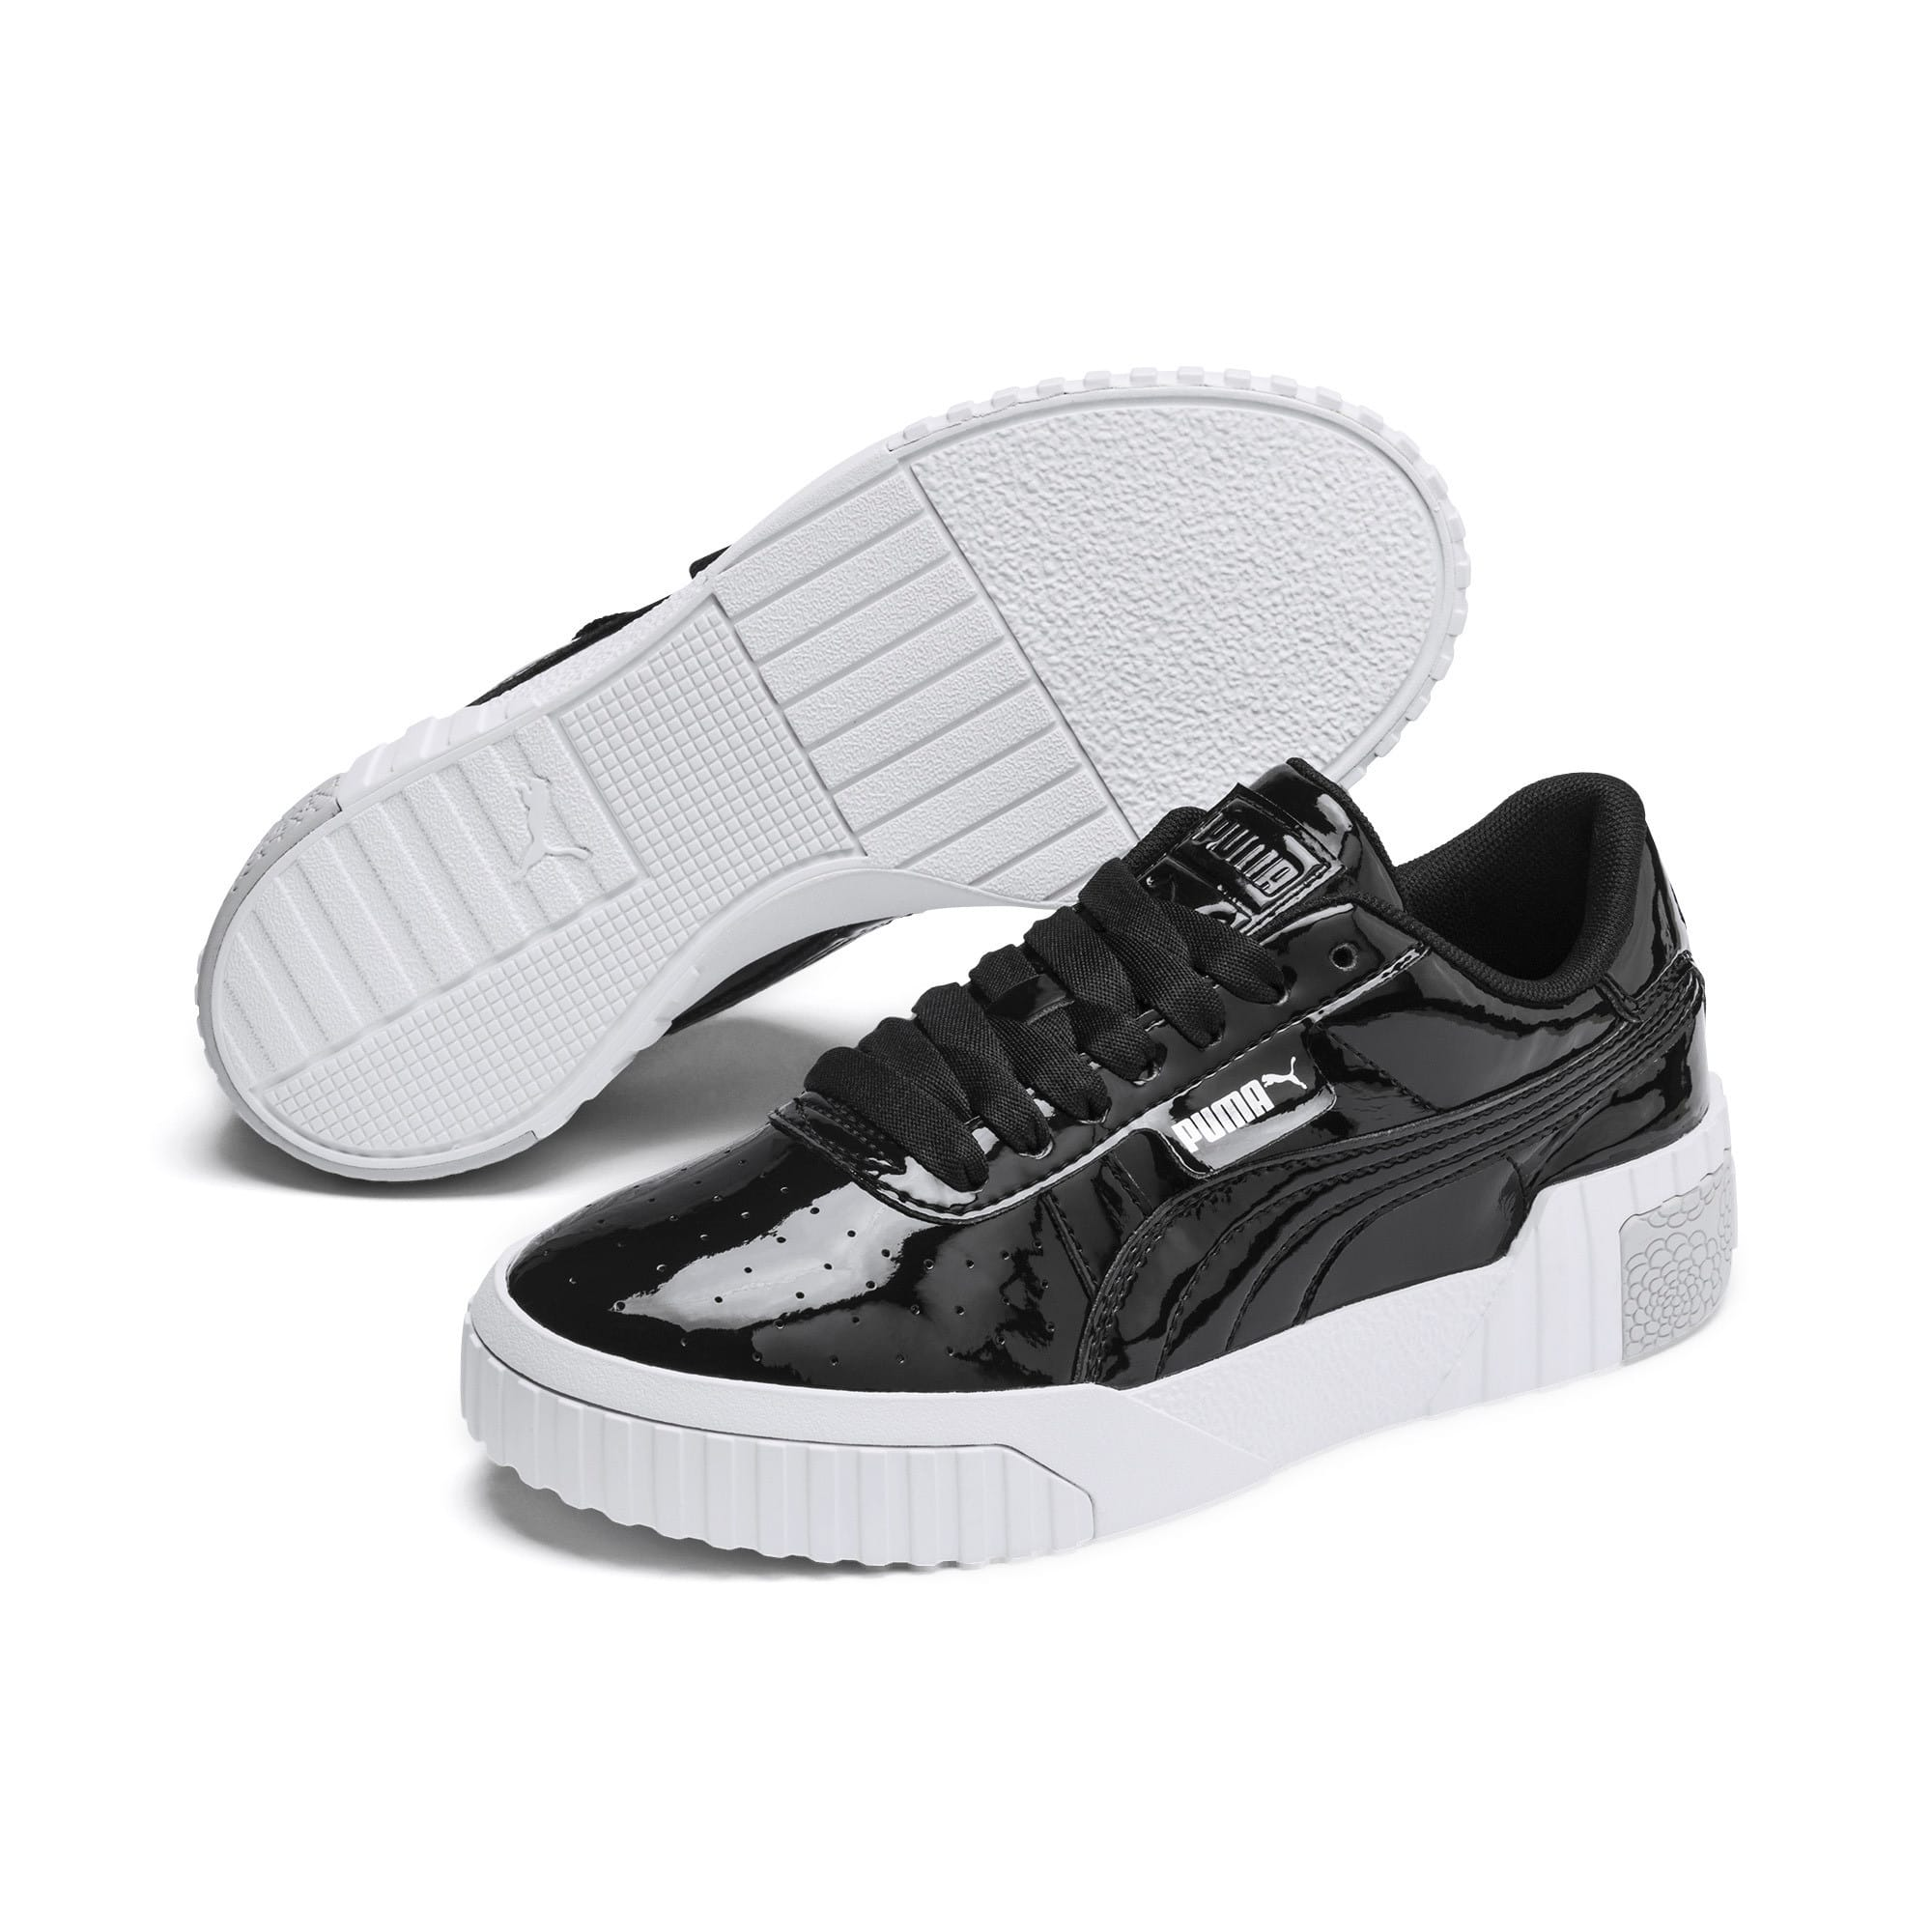 Thumbnail 2 of Cali Patent Sneakers JR, Puma Black-Puma White, medium